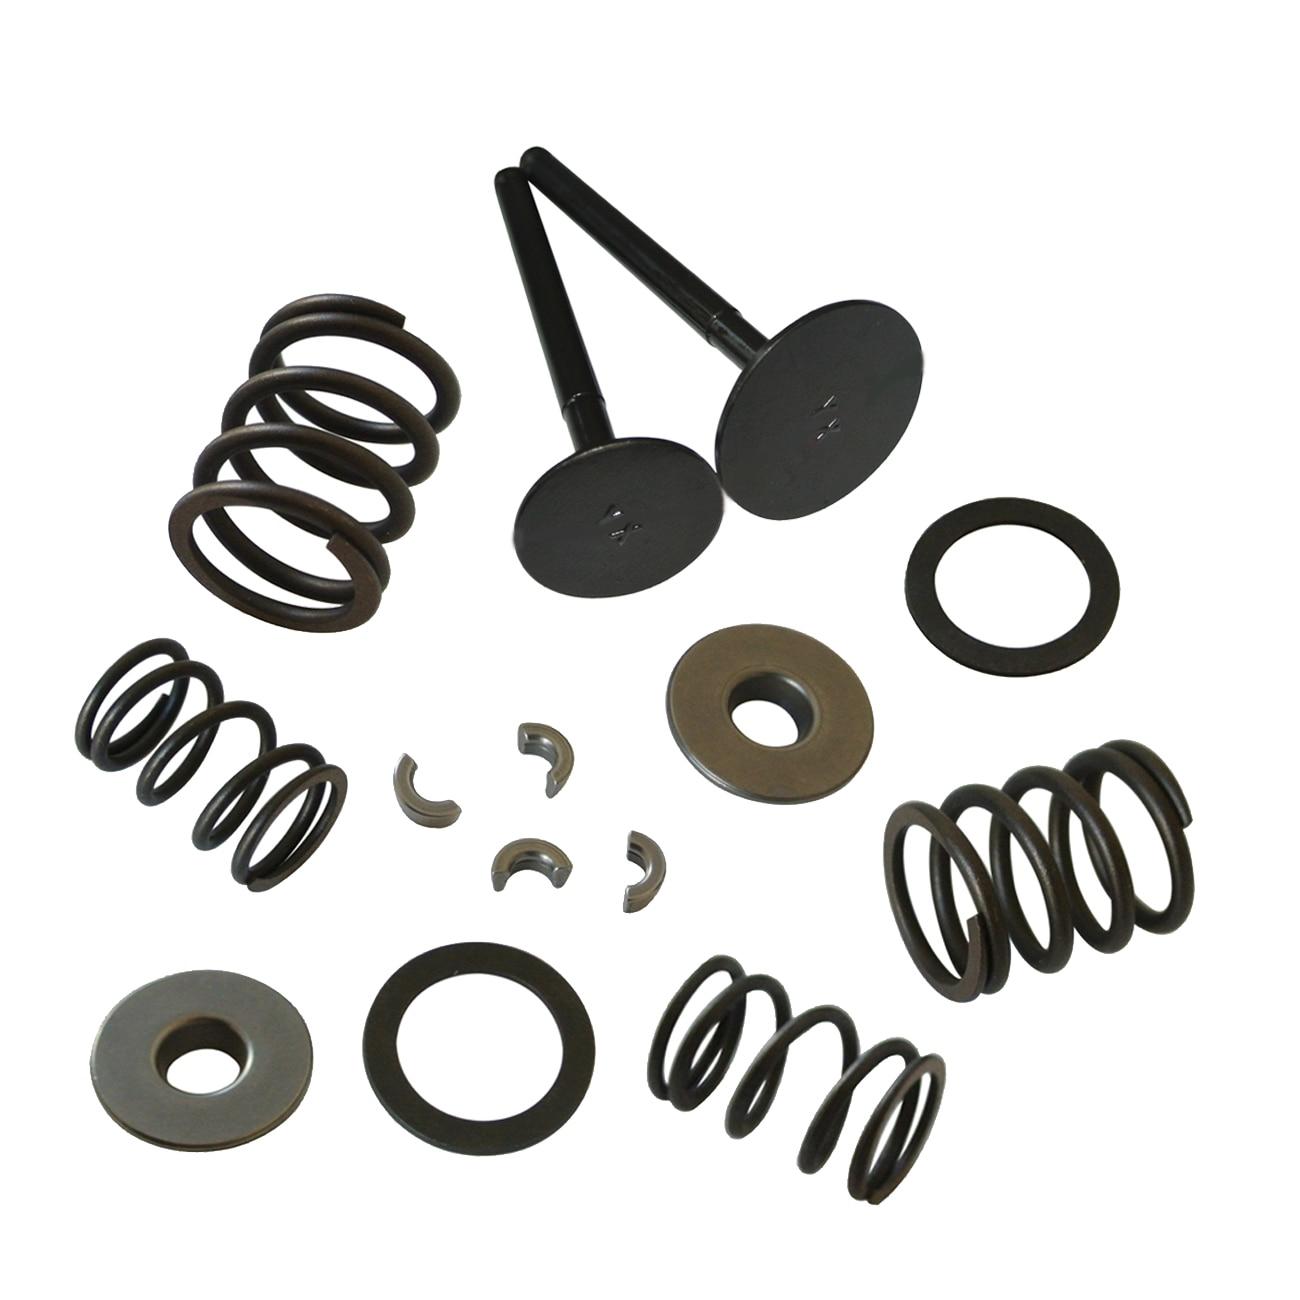 Engine Intake Exhaust Valves & Spring Kit For YX 150cc Pit Pro Travel Dirt Bike